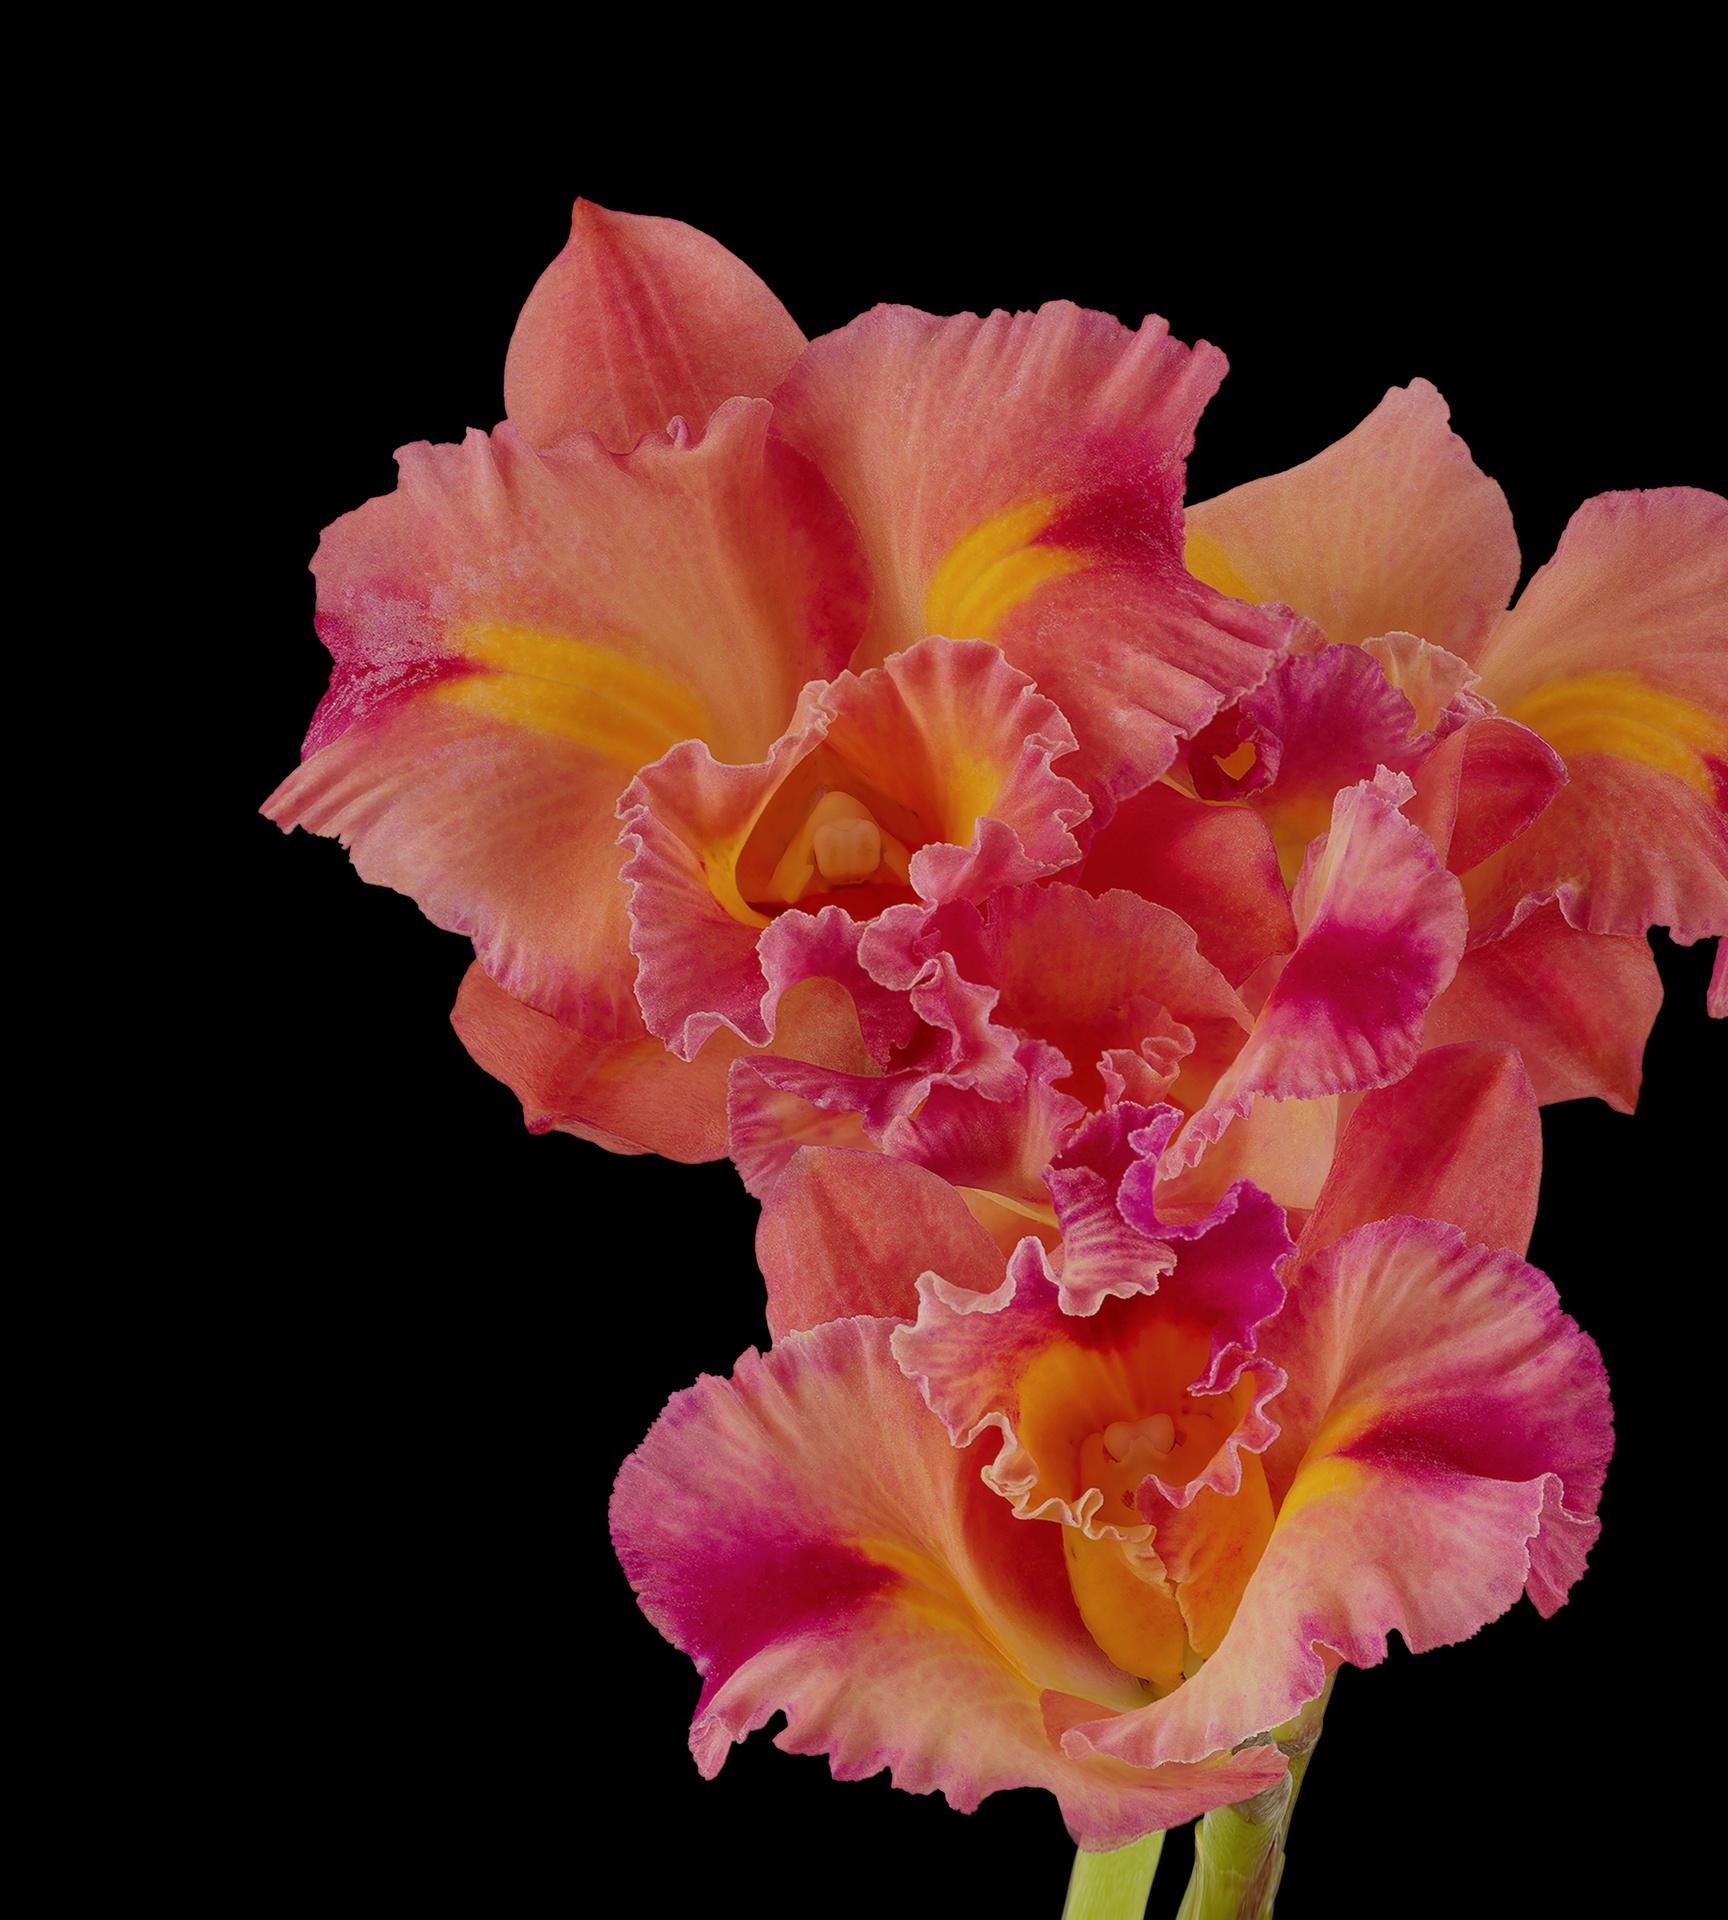 Pixel 6 Pro Wallpaper Cattleya Orchid dark by Andrew Zuckerman